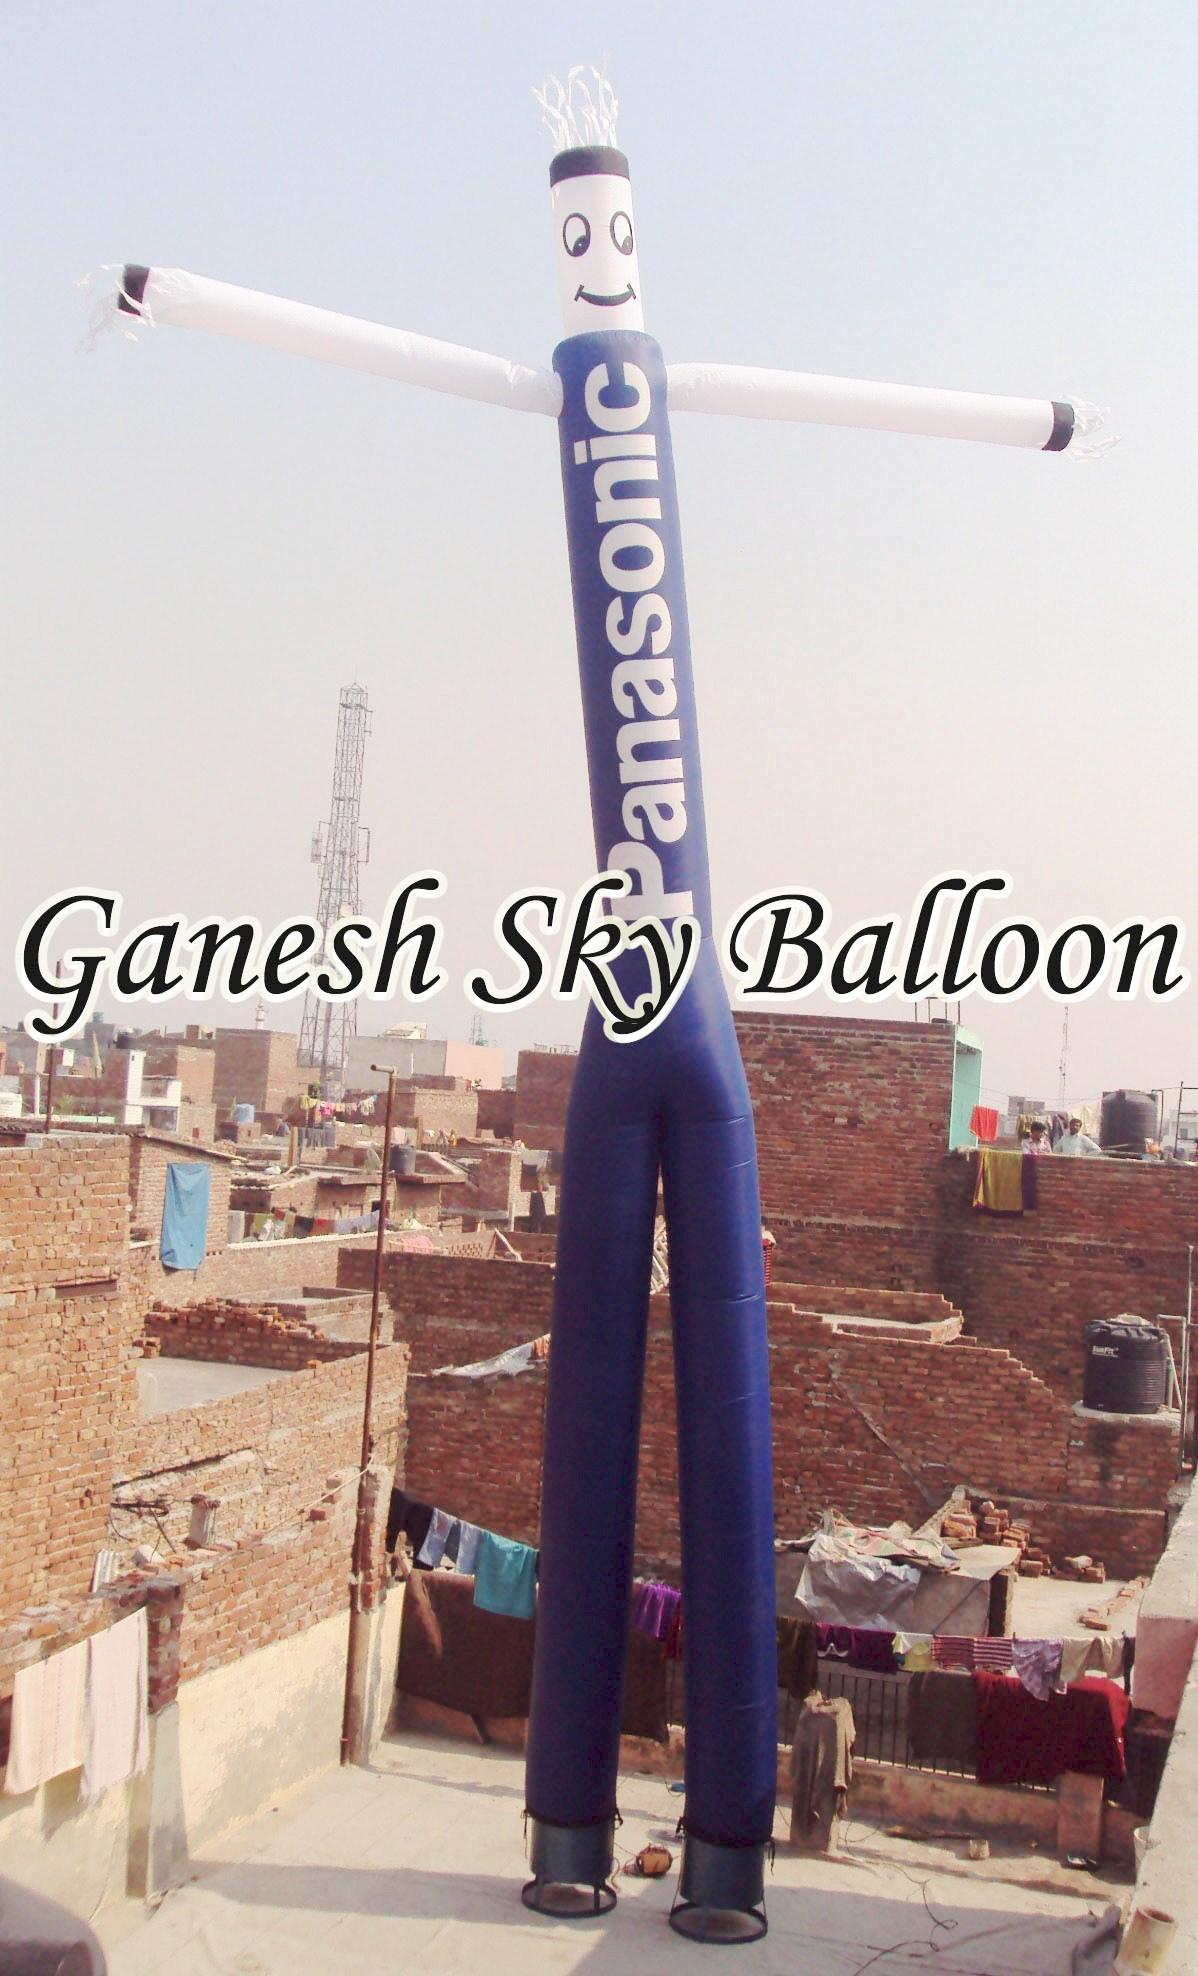 Advertising Air Dancer